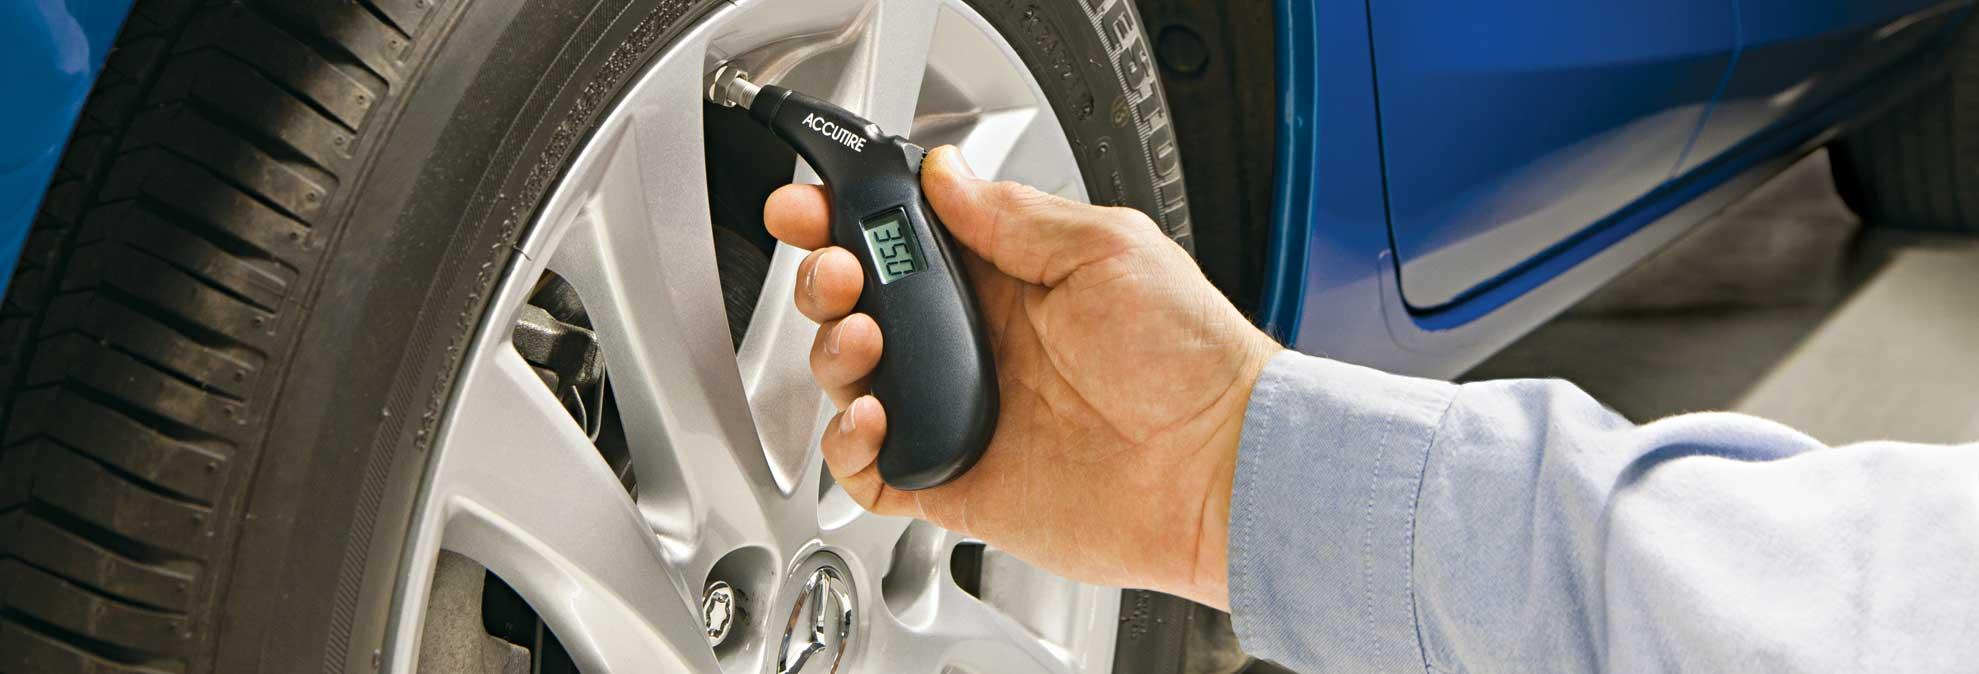 Best Tire Pressure Gauge 2020 Best Tire Pressure Gauge Buying Guide   Consumer Reports